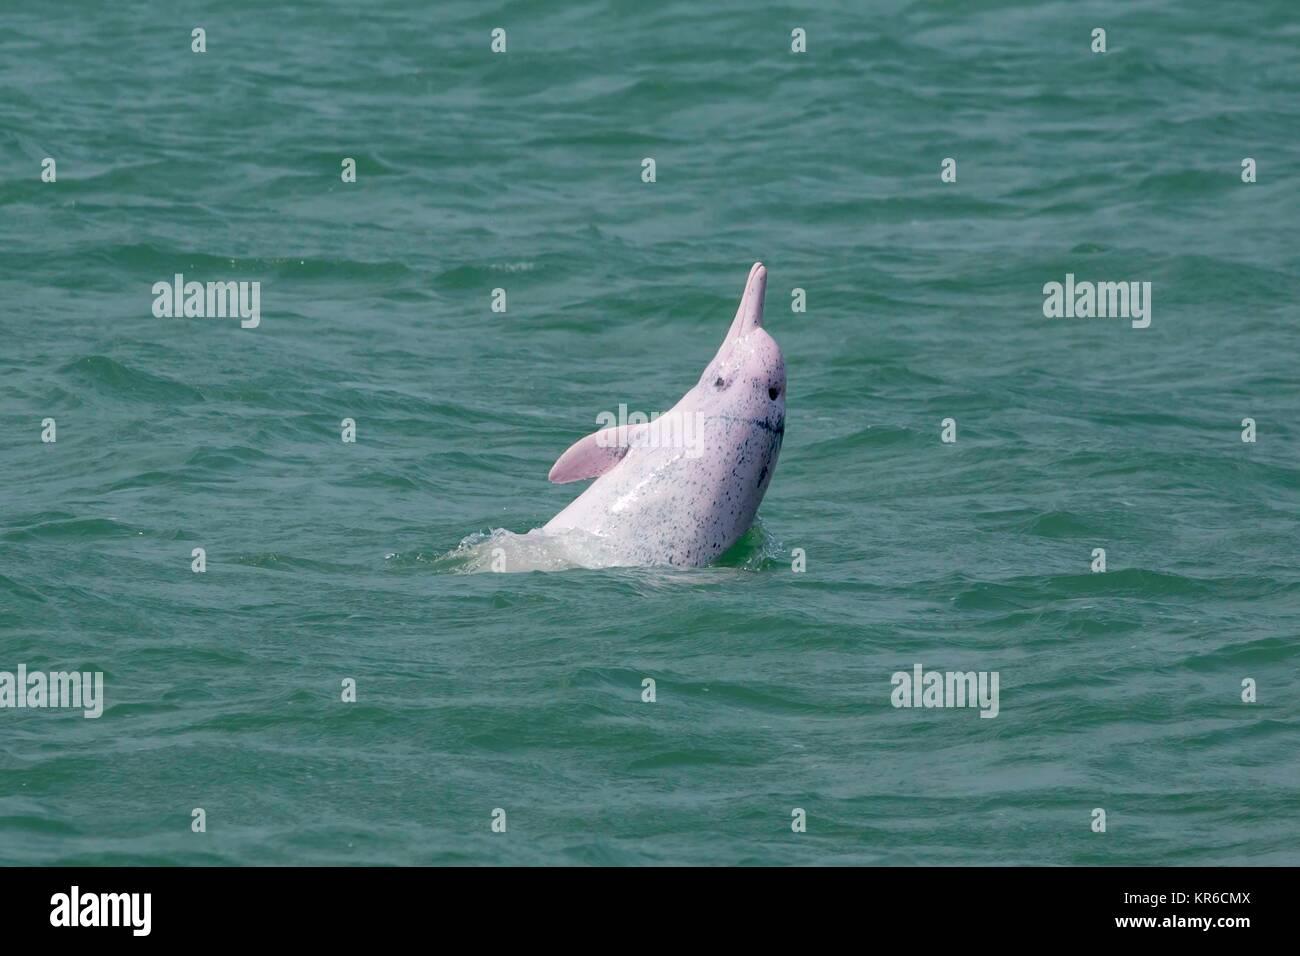 Delfín jorobado Indo-Pacifico / Delfín Blanco Chino / Delfín Rosado (Sousa chinensis) - ferry de Imagen De Stock